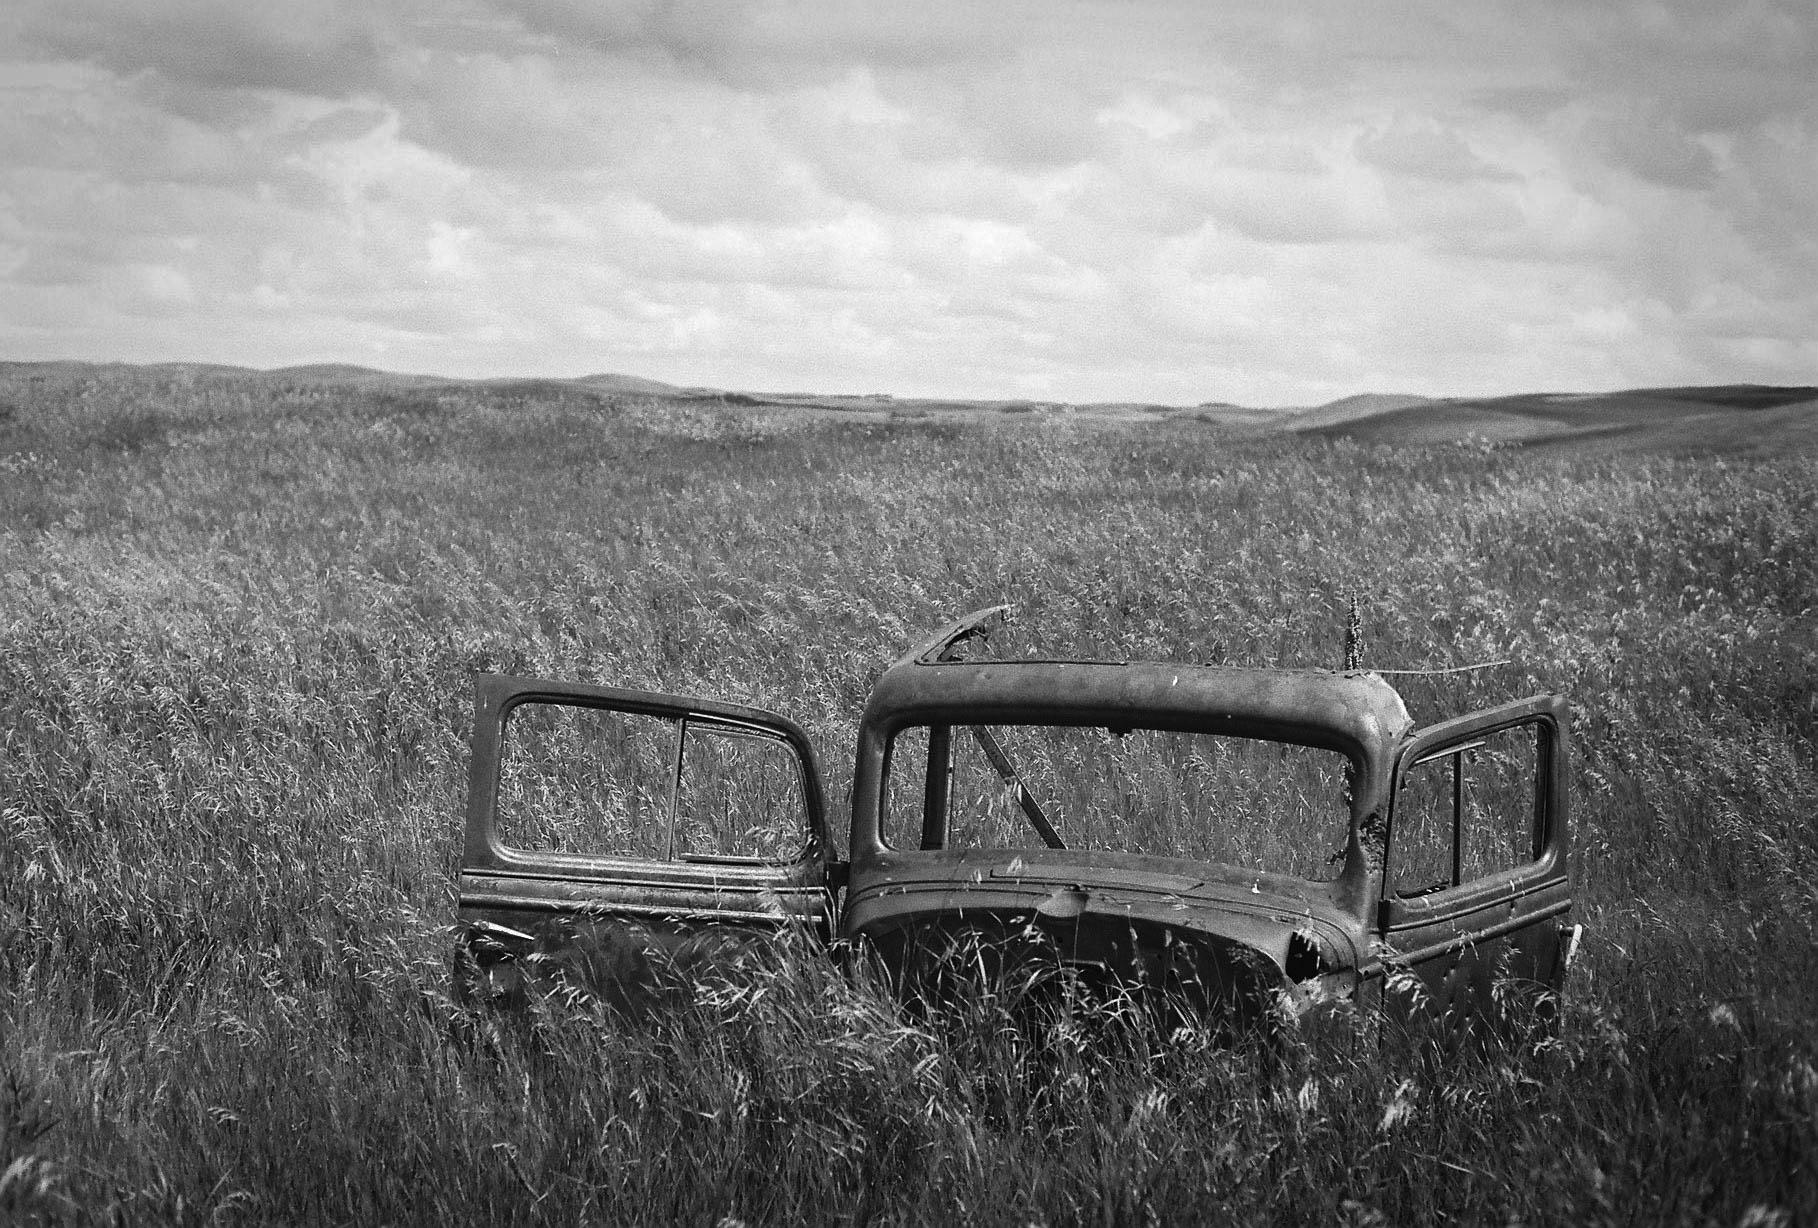 Truck cab Hanna, Alberta Leica M3, Canon 50mm F1.4 Ilford Pan F Plus 50 film 7.16